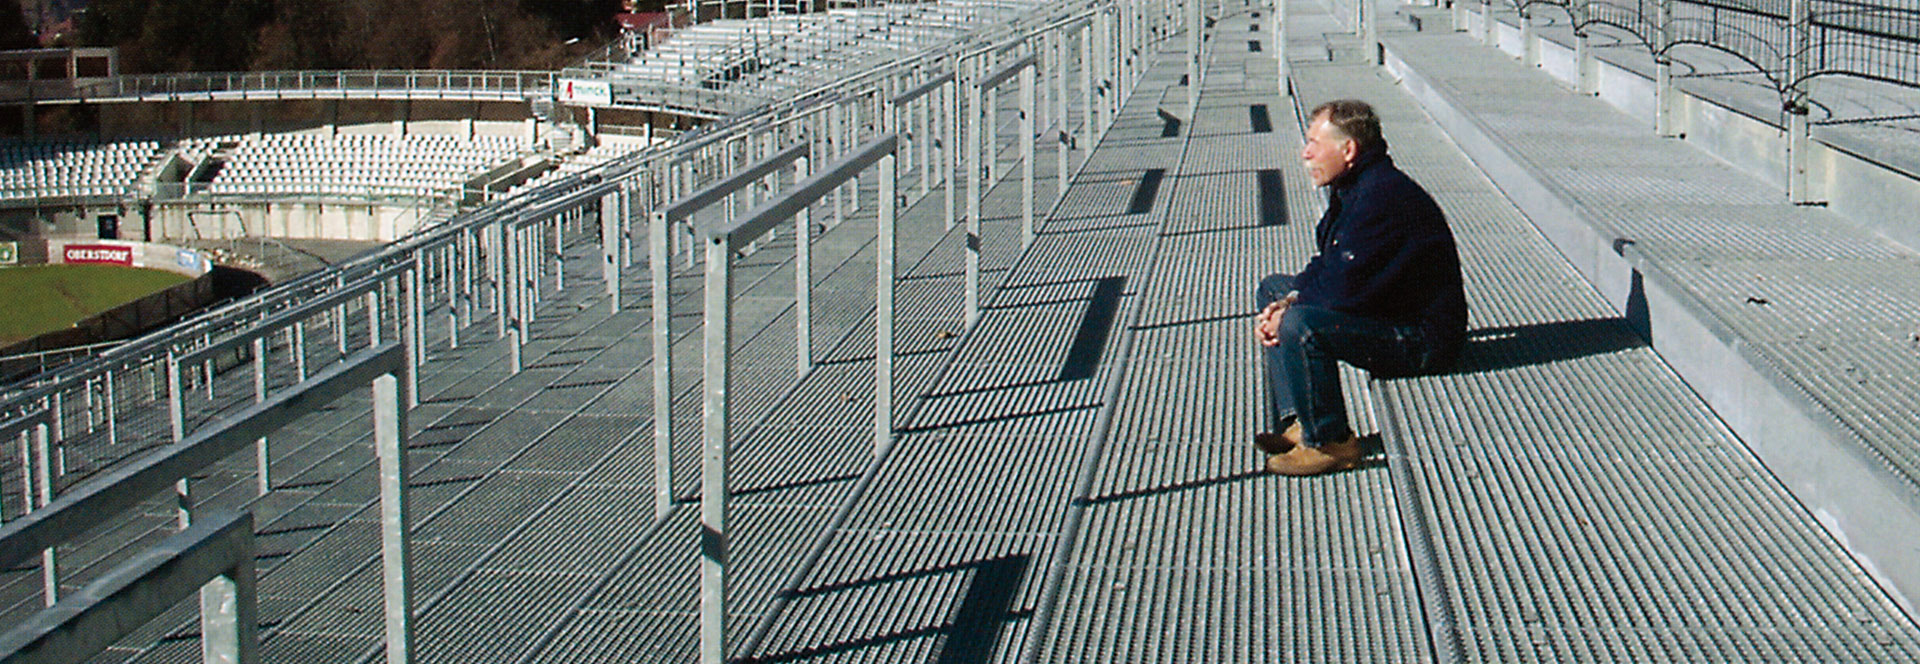 MEA Metal Applications - Referenzen Skistadion Oberstdorf